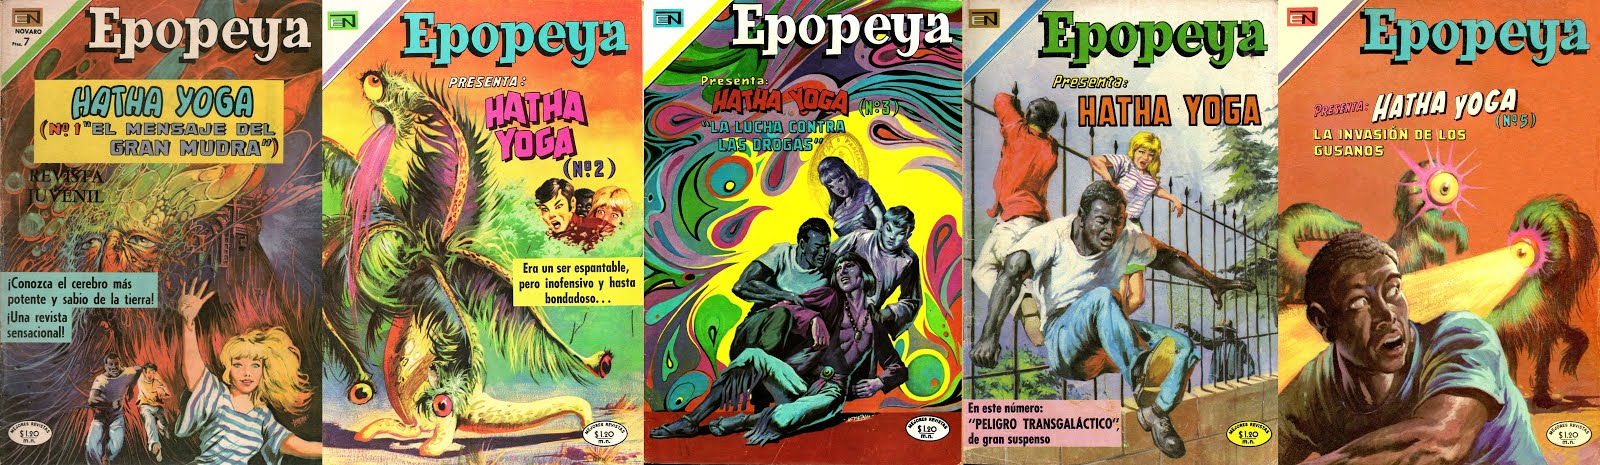 La serie Hatha-Yoga en Epopeya Novaro